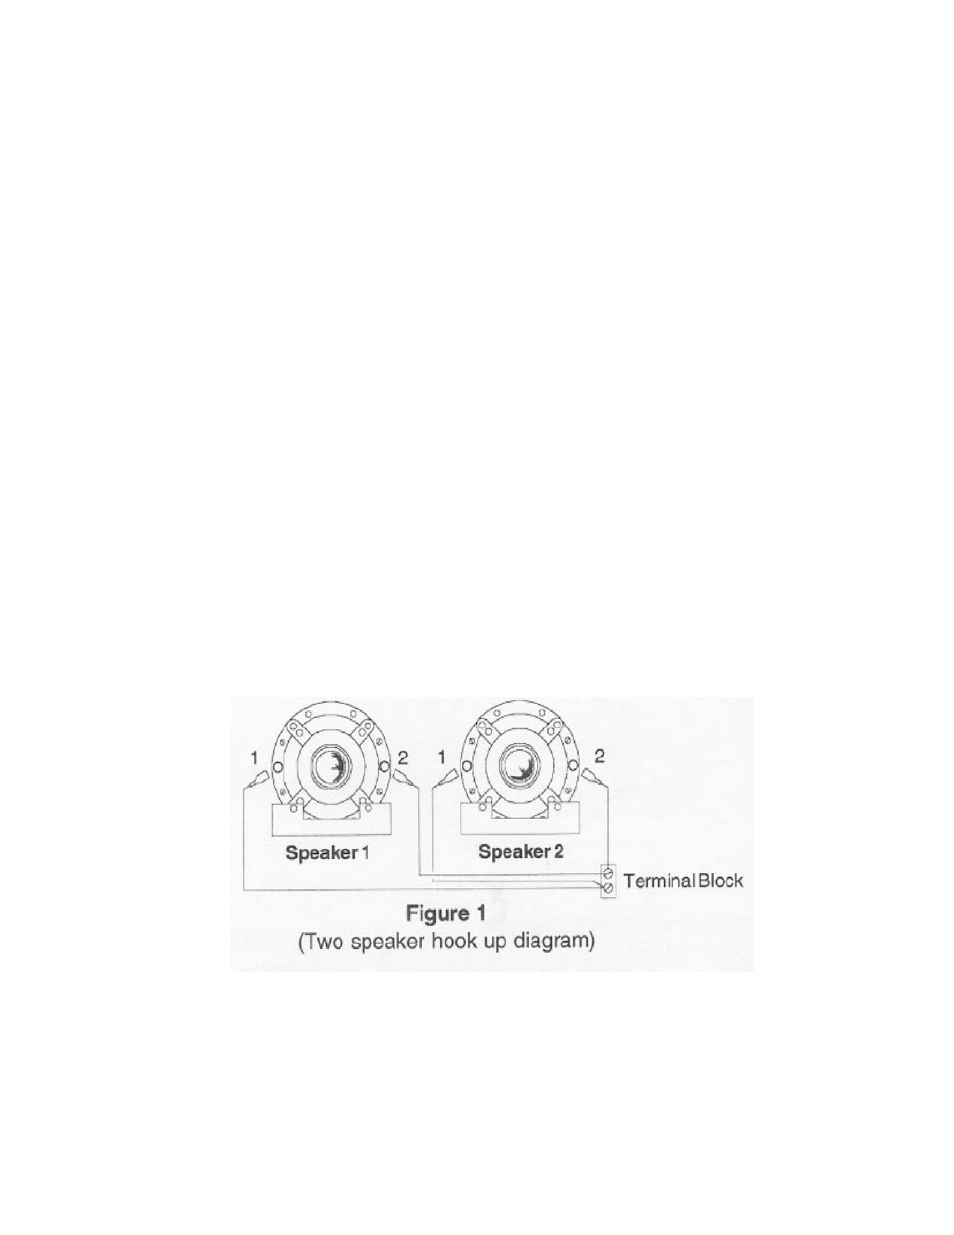 Speakers Horn Wiring Diagram on basic car stereo wiring diagram, amp wiring diagram, 2 amplifiers diagram, 2 switches diagram, 2 speaker cable, loudspeaker diagram, mixer wiring diagram, 2 switch diagram, for a dual plug wiring diagram,